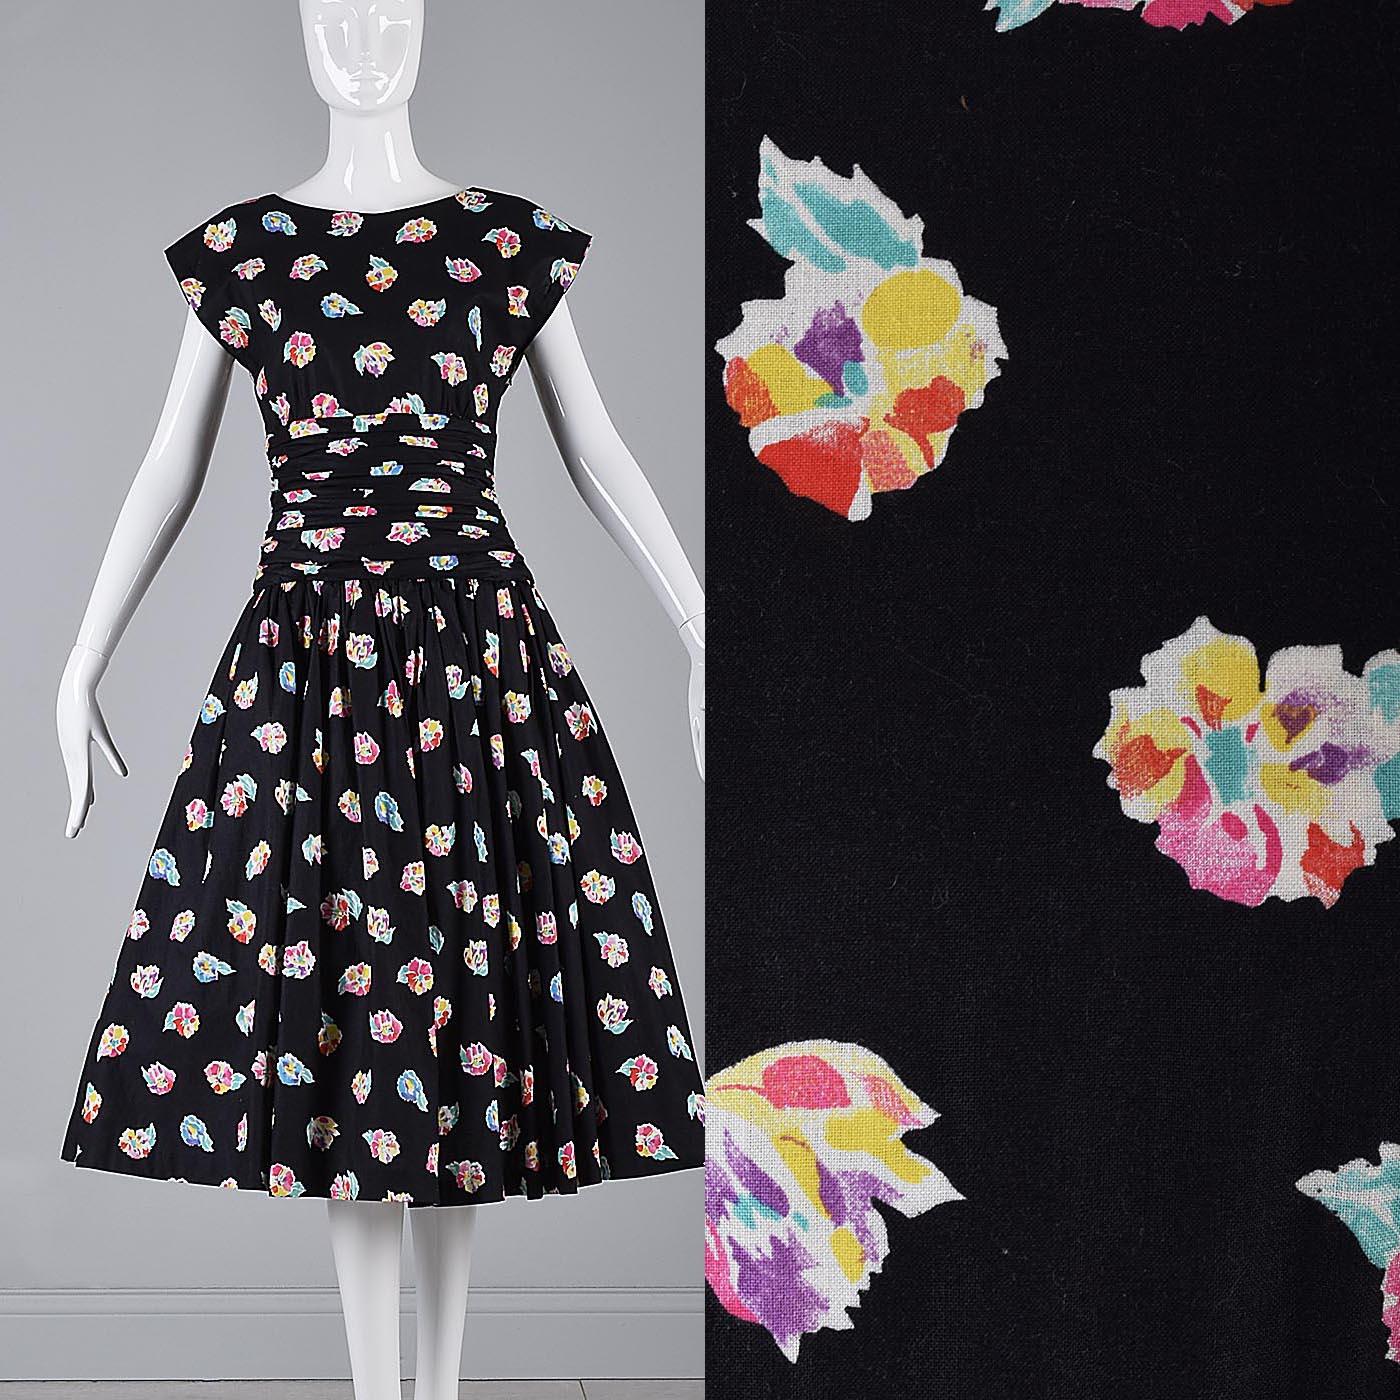 86c9a6c684ff M Vintage 1980s 80s Sleeveless Summer Dress Full Skirt Fit & Flare ...